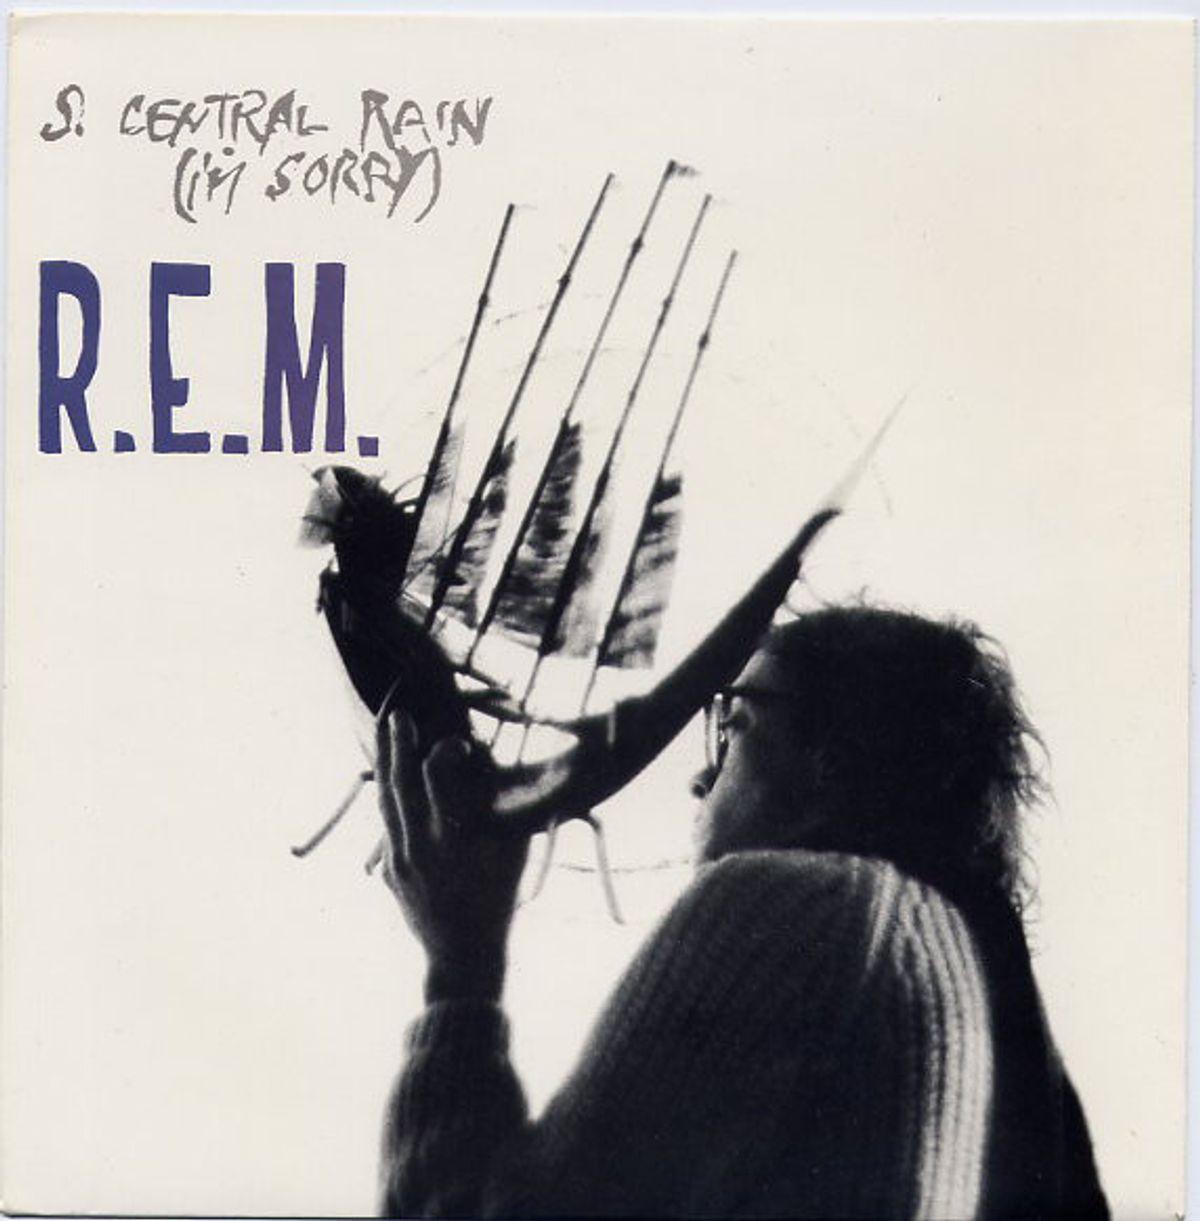 #RickenbackerRules - R.E.M. - So. Central Rain (I'm Sorry) (1984)